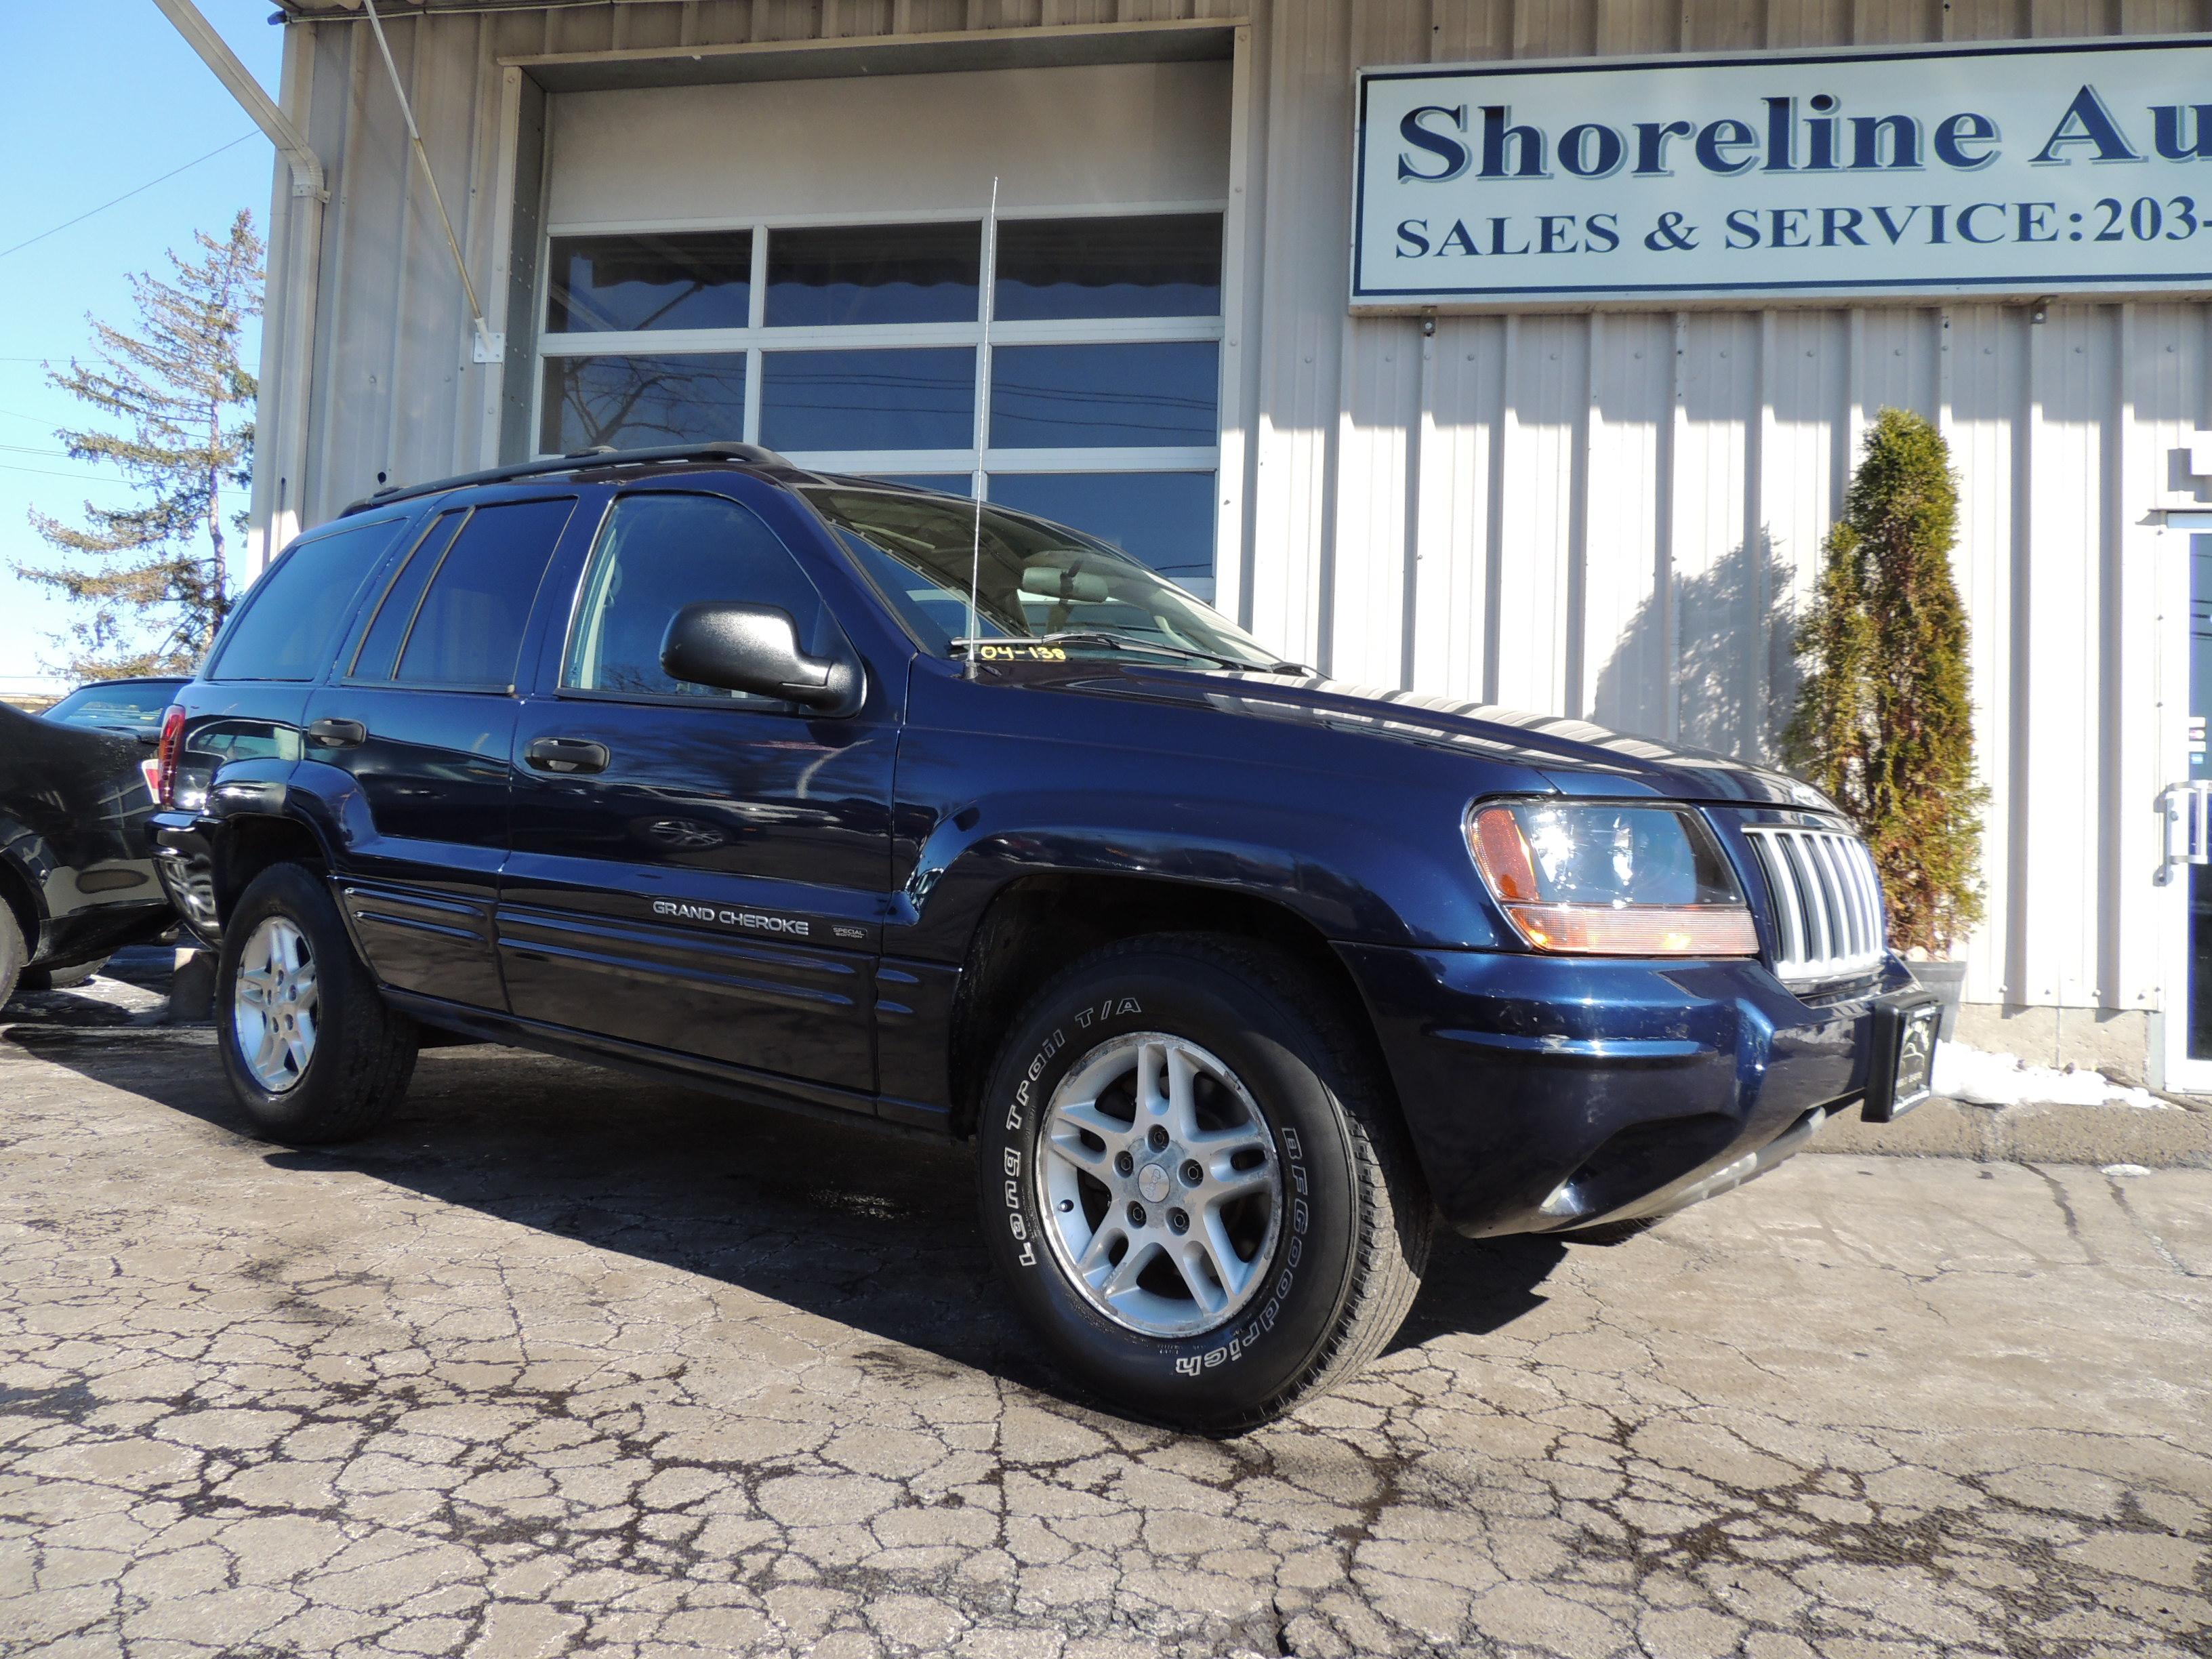 2004 jeep grand cherokee special edition shoreline auto sales. Black Bedroom Furniture Sets. Home Design Ideas